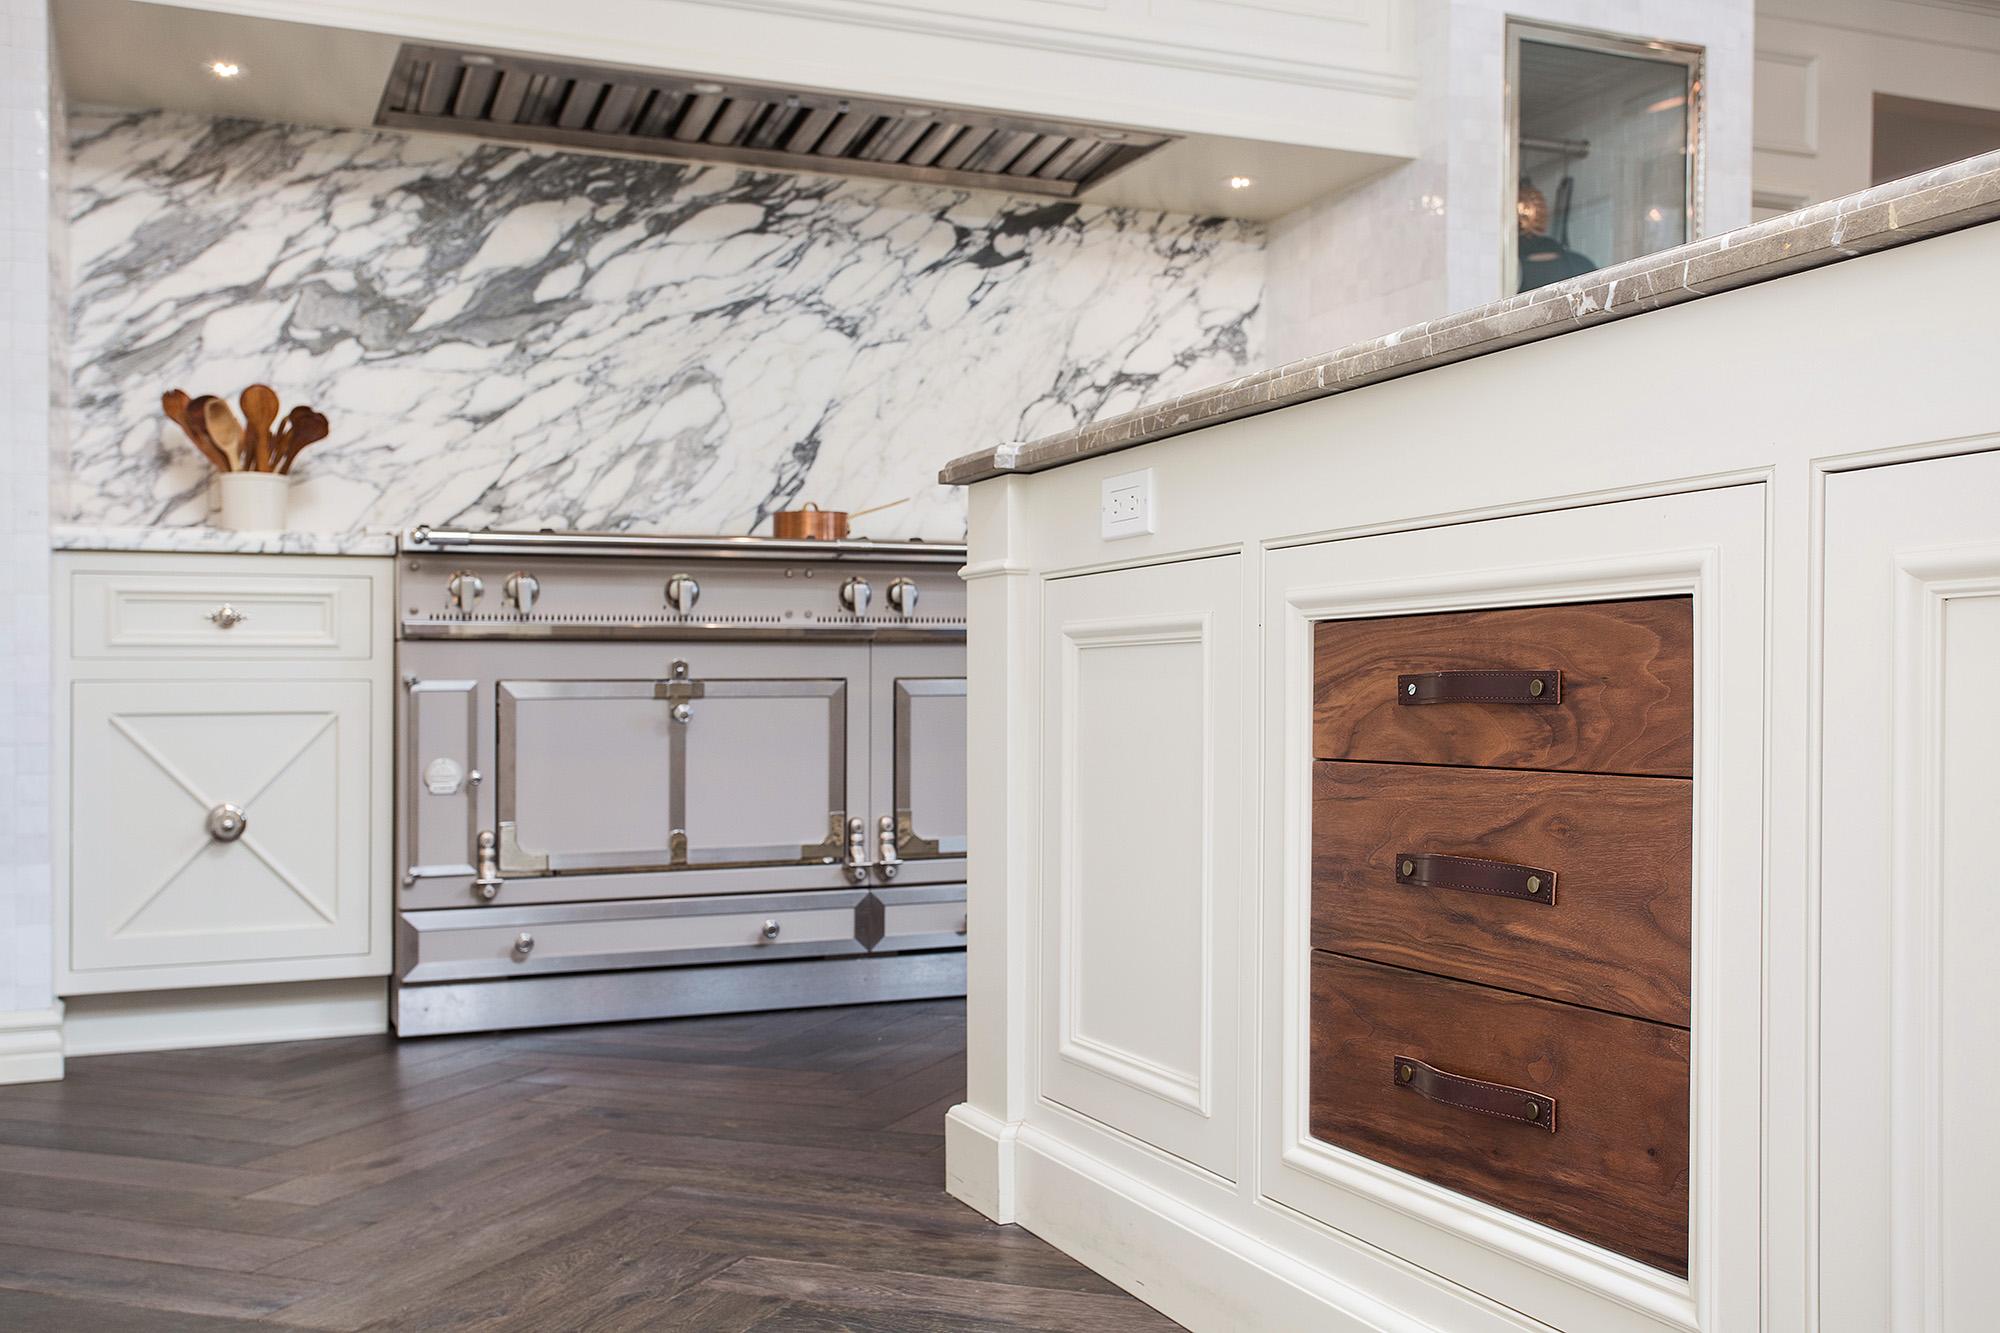 kitchen-drawers-wood-chelsea.jpg